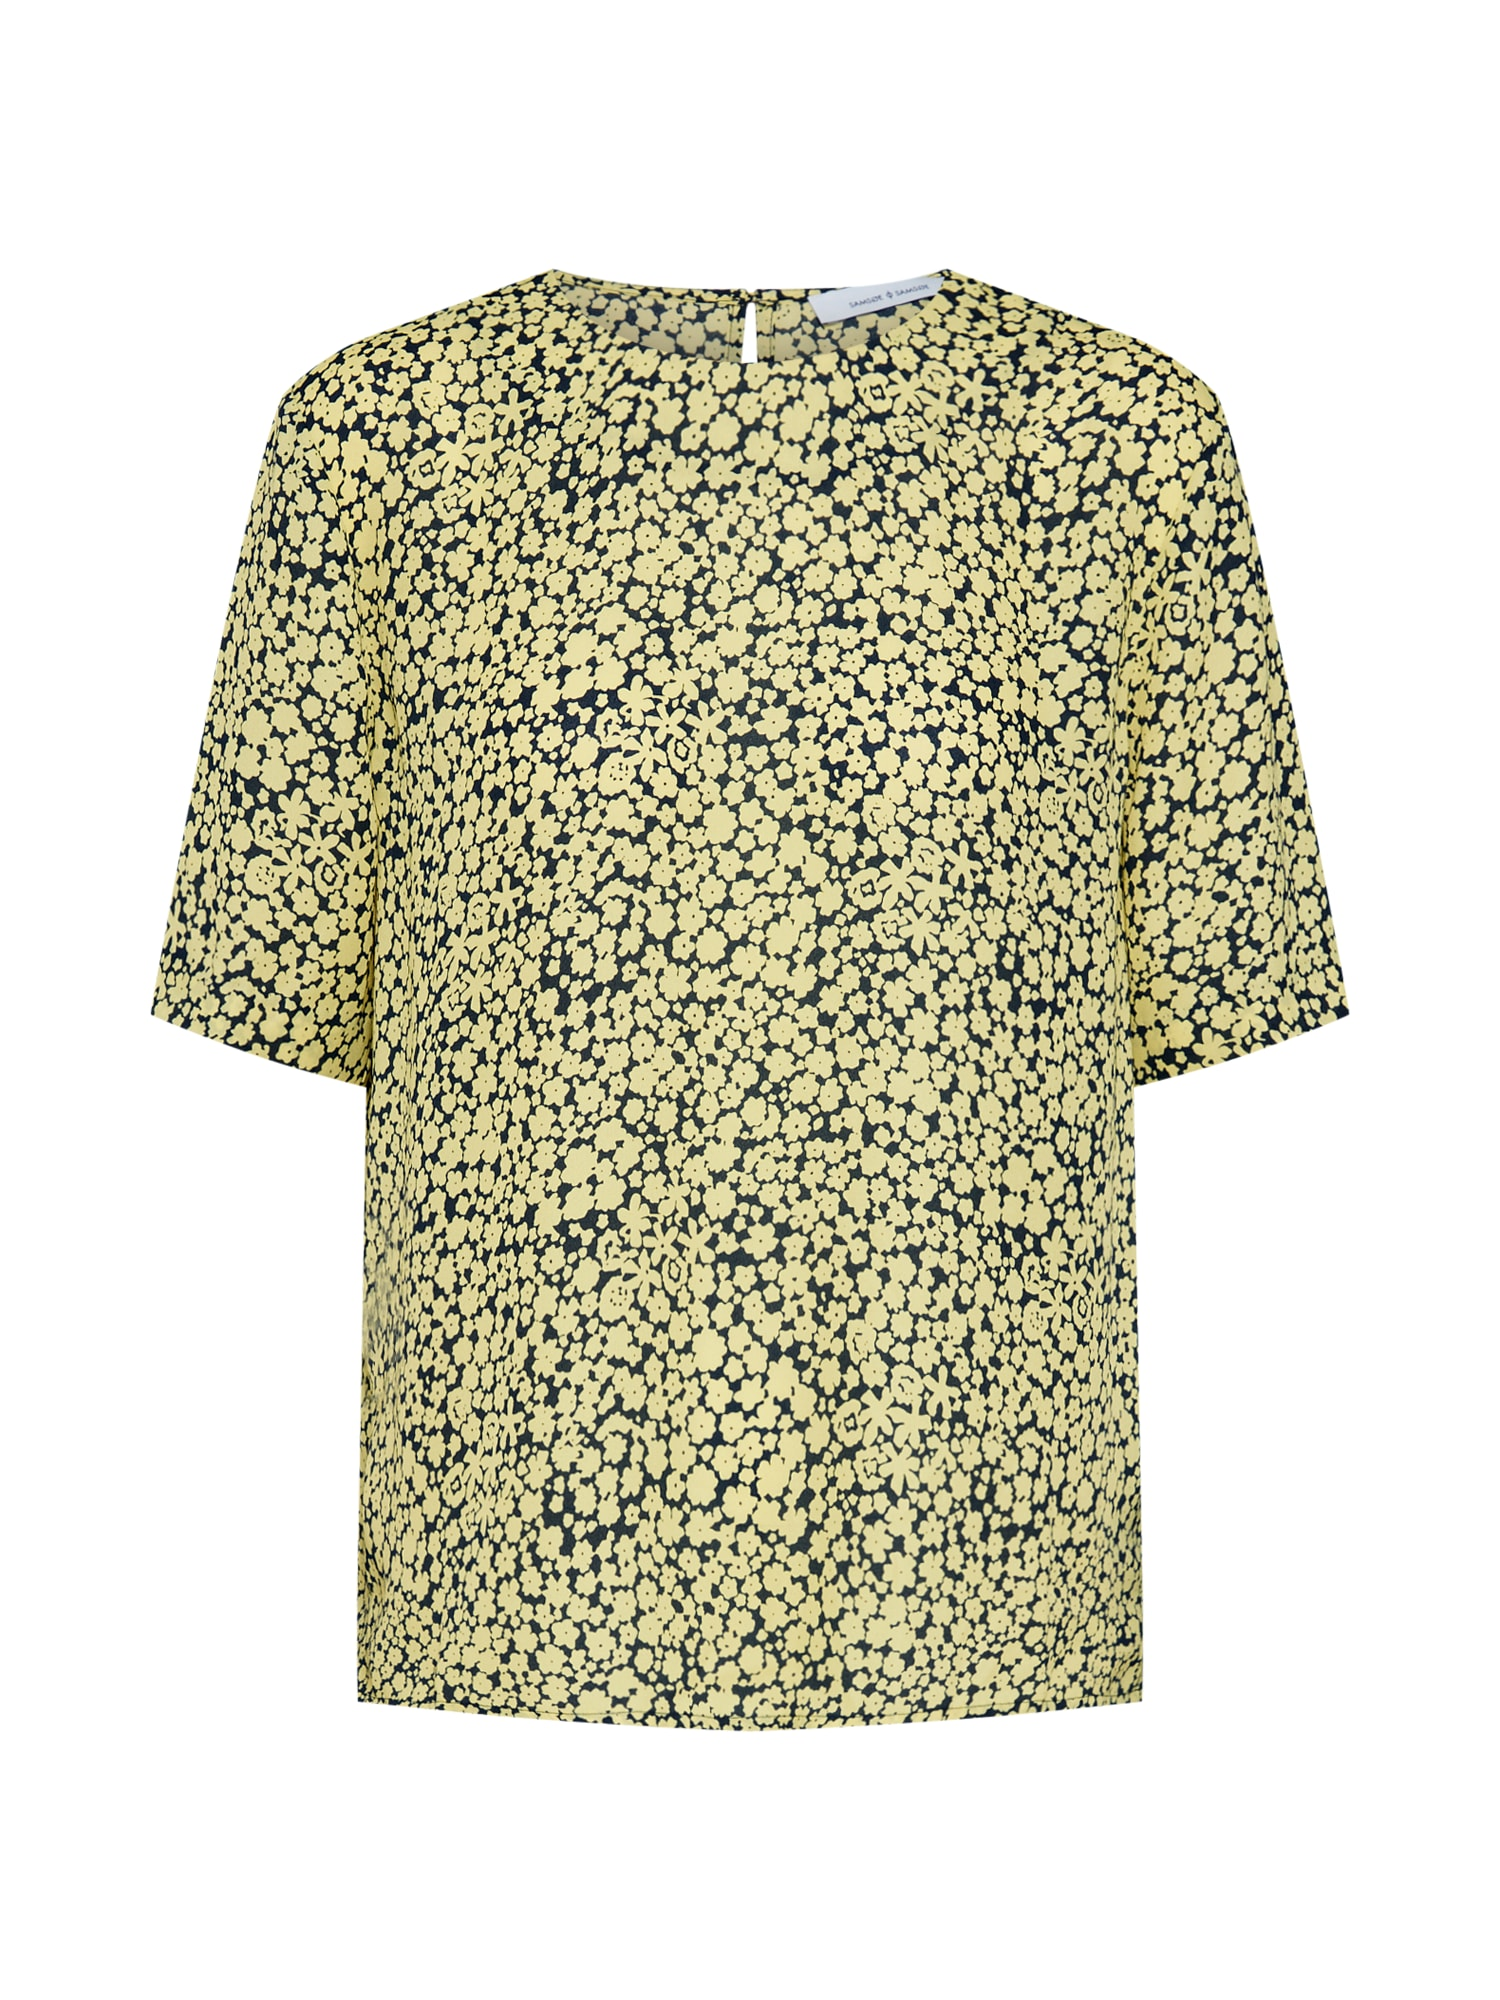 Tričko Amabel žlutá černá Samsoe & Samsoe